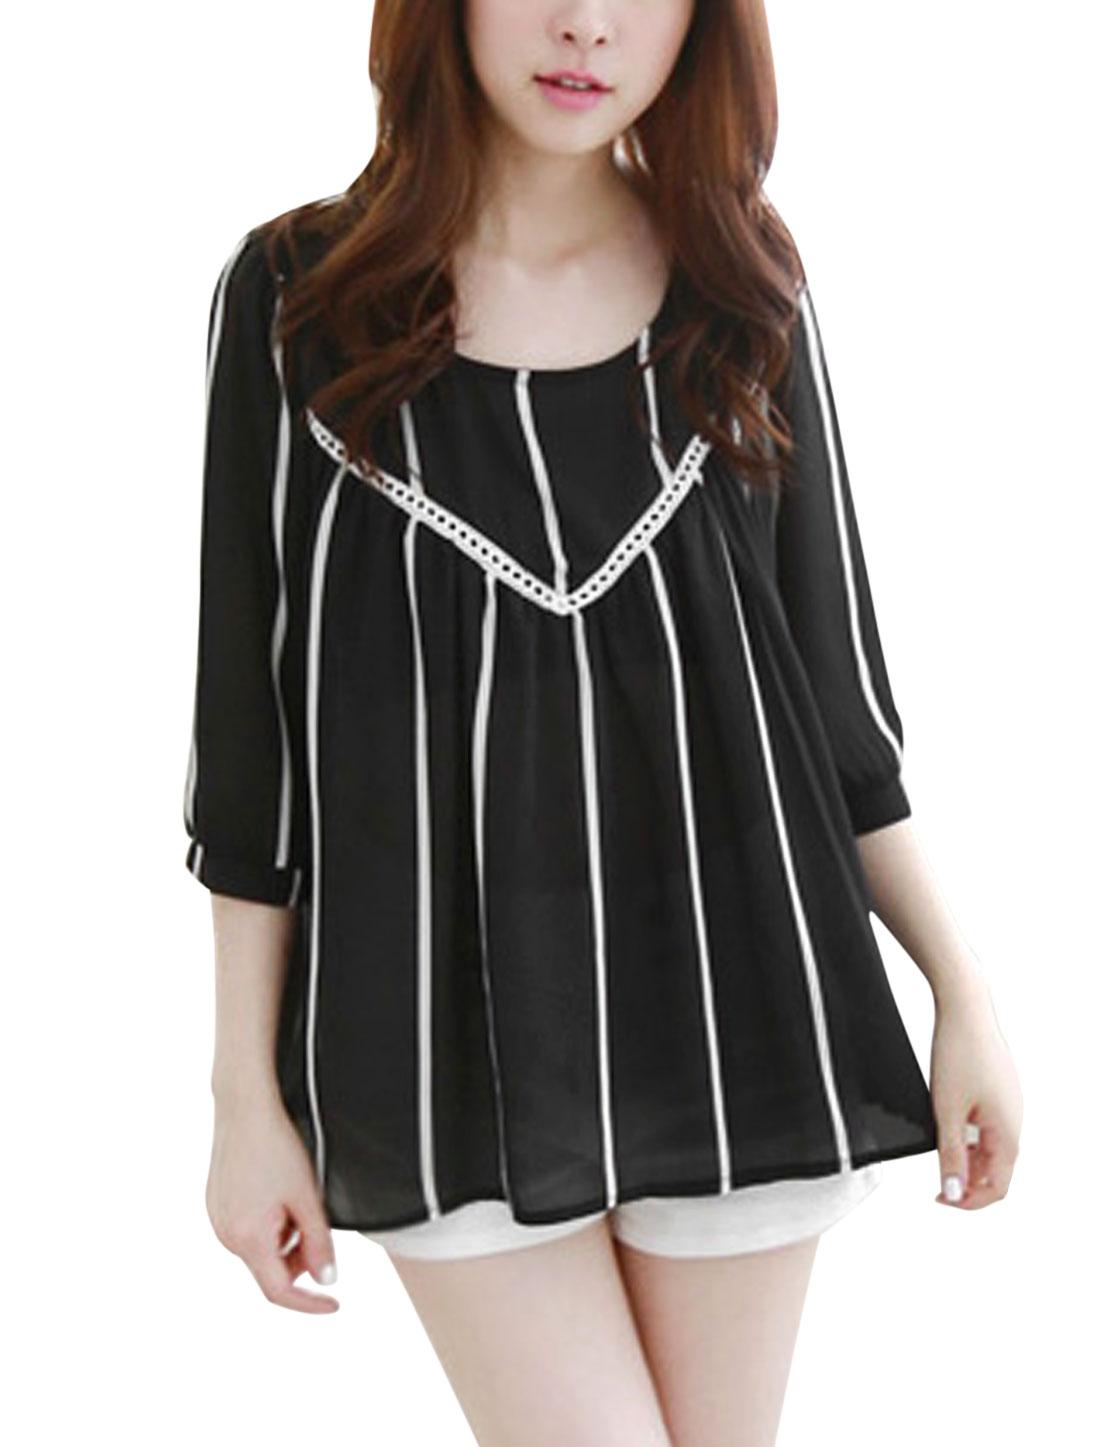 Women Stripes 3/4 Sleeve Semi Sheer Casual Loose Chiffon Top Black XS